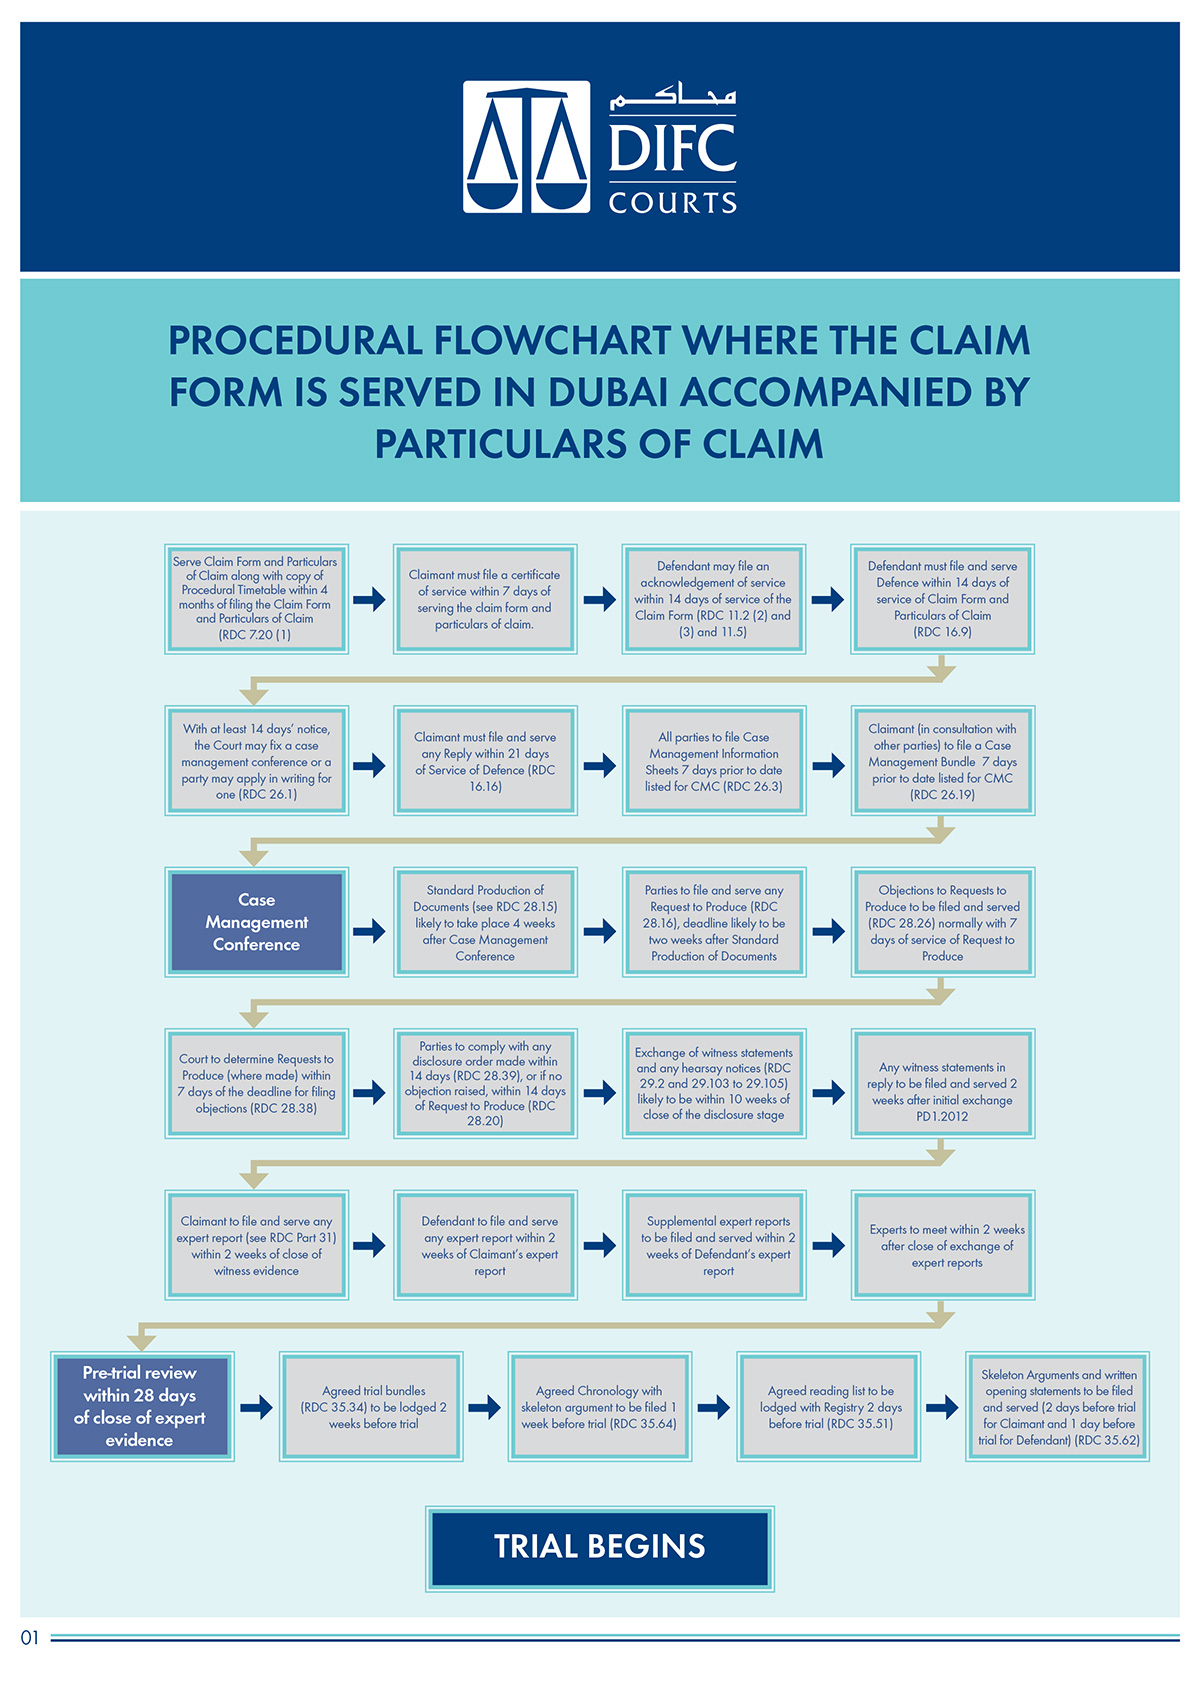 difc-case-progression-flow-charts-2.jpg